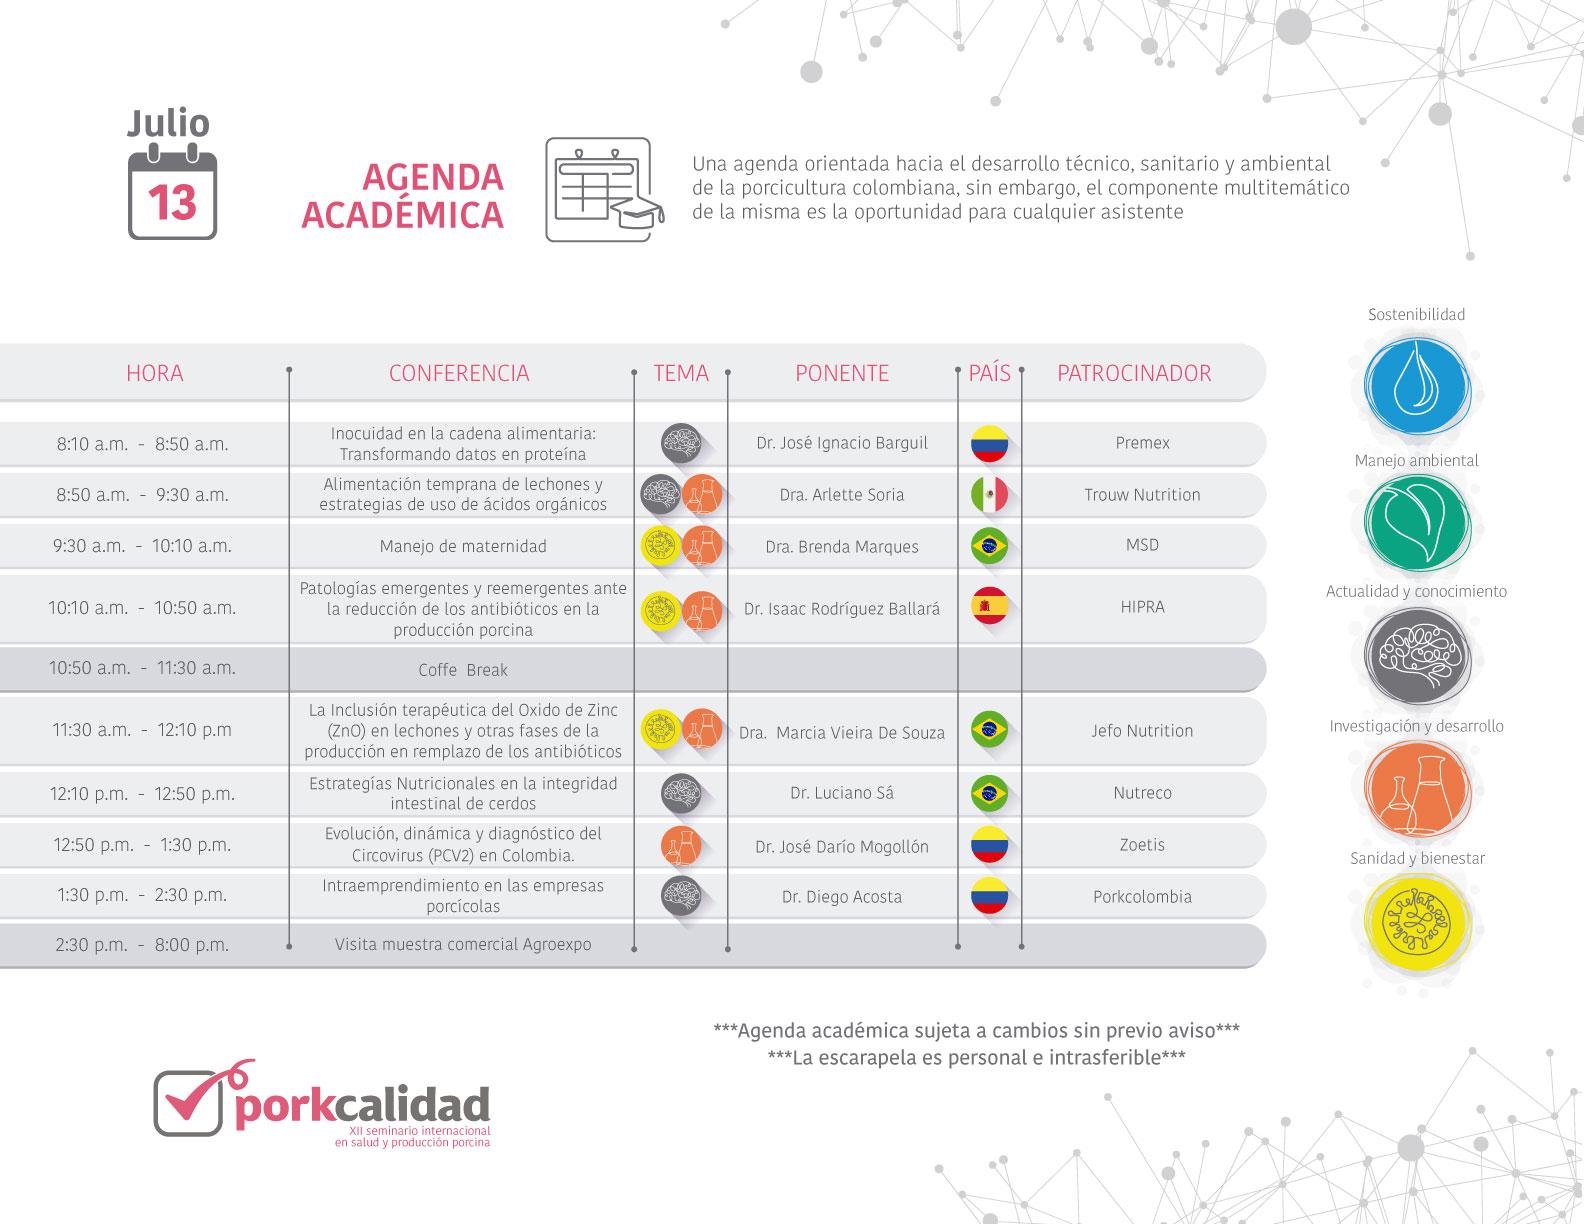 https://www.porkcolombia.co/wp-content/uploads/2018/09/Agenda13Julio-1.jpg